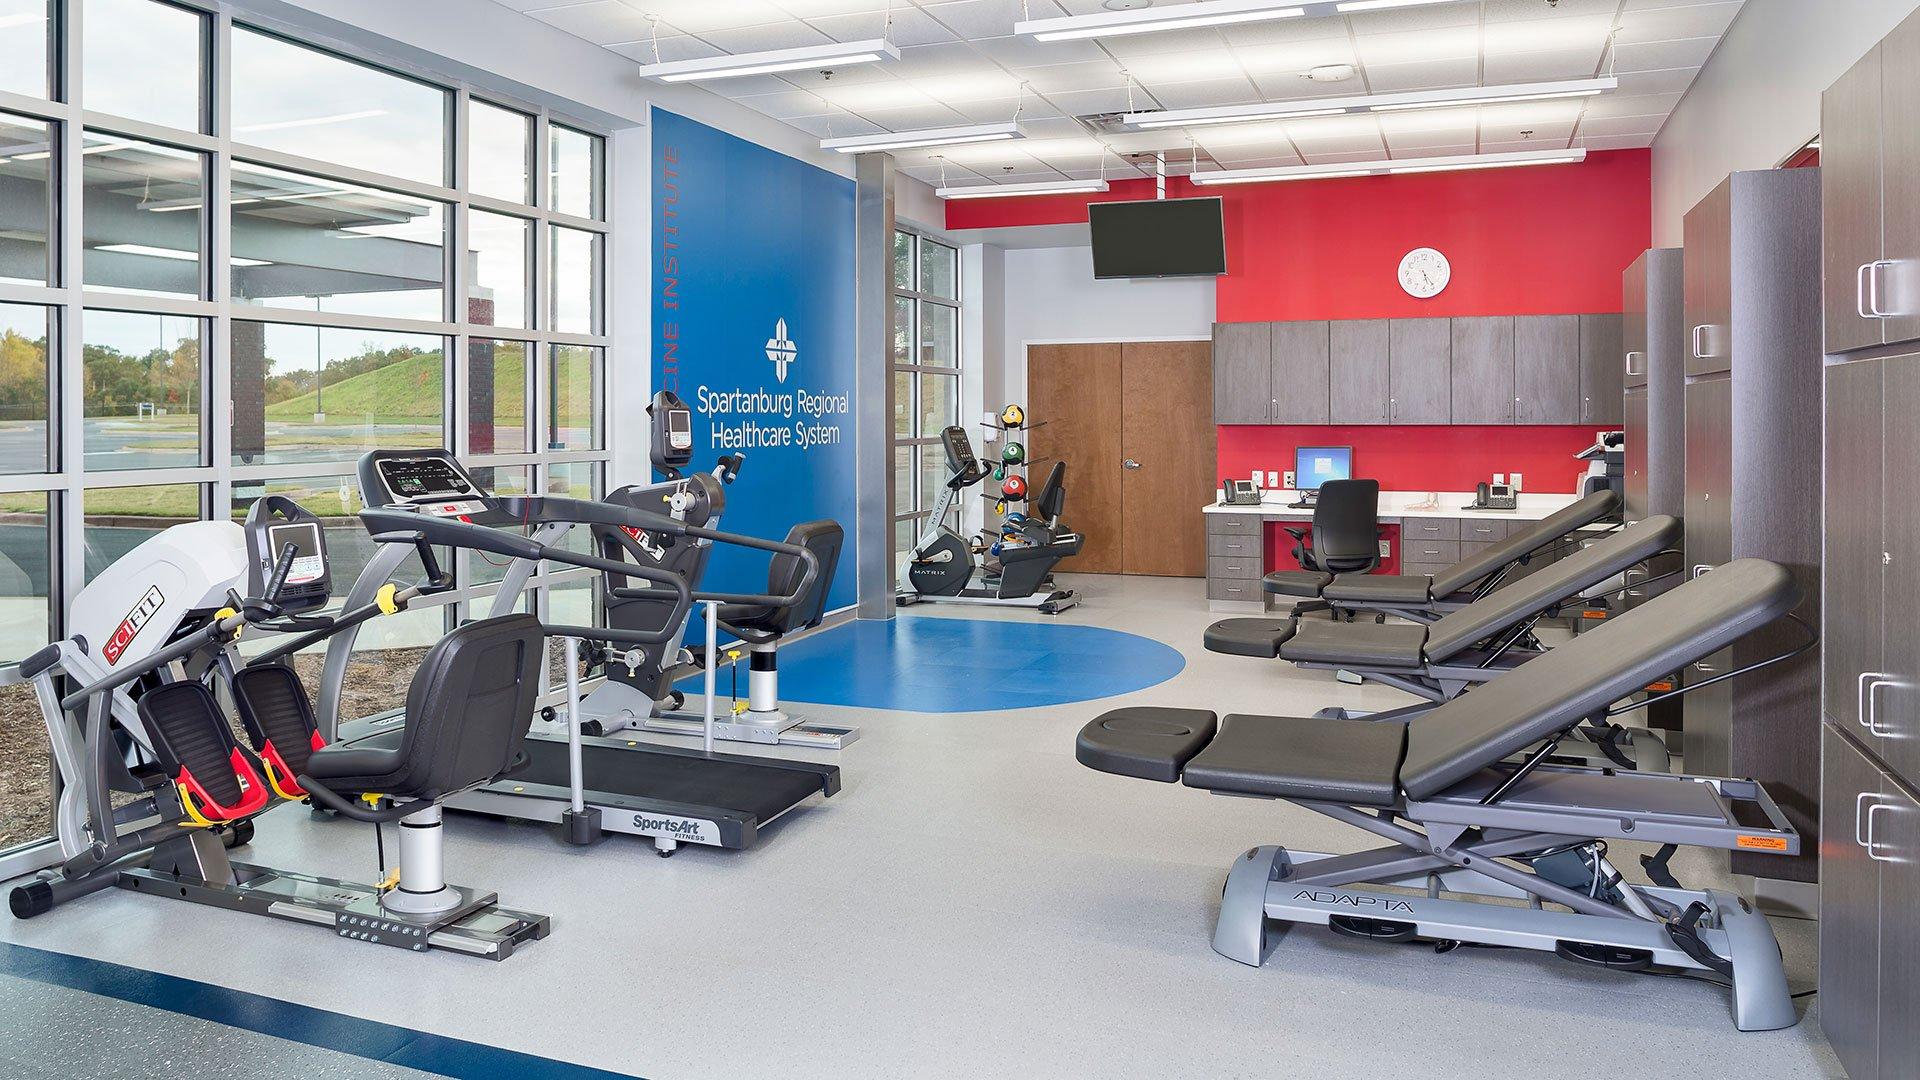 Spartanburg Regional Healthcare, Sports Medicine Institute at Upward Star Center